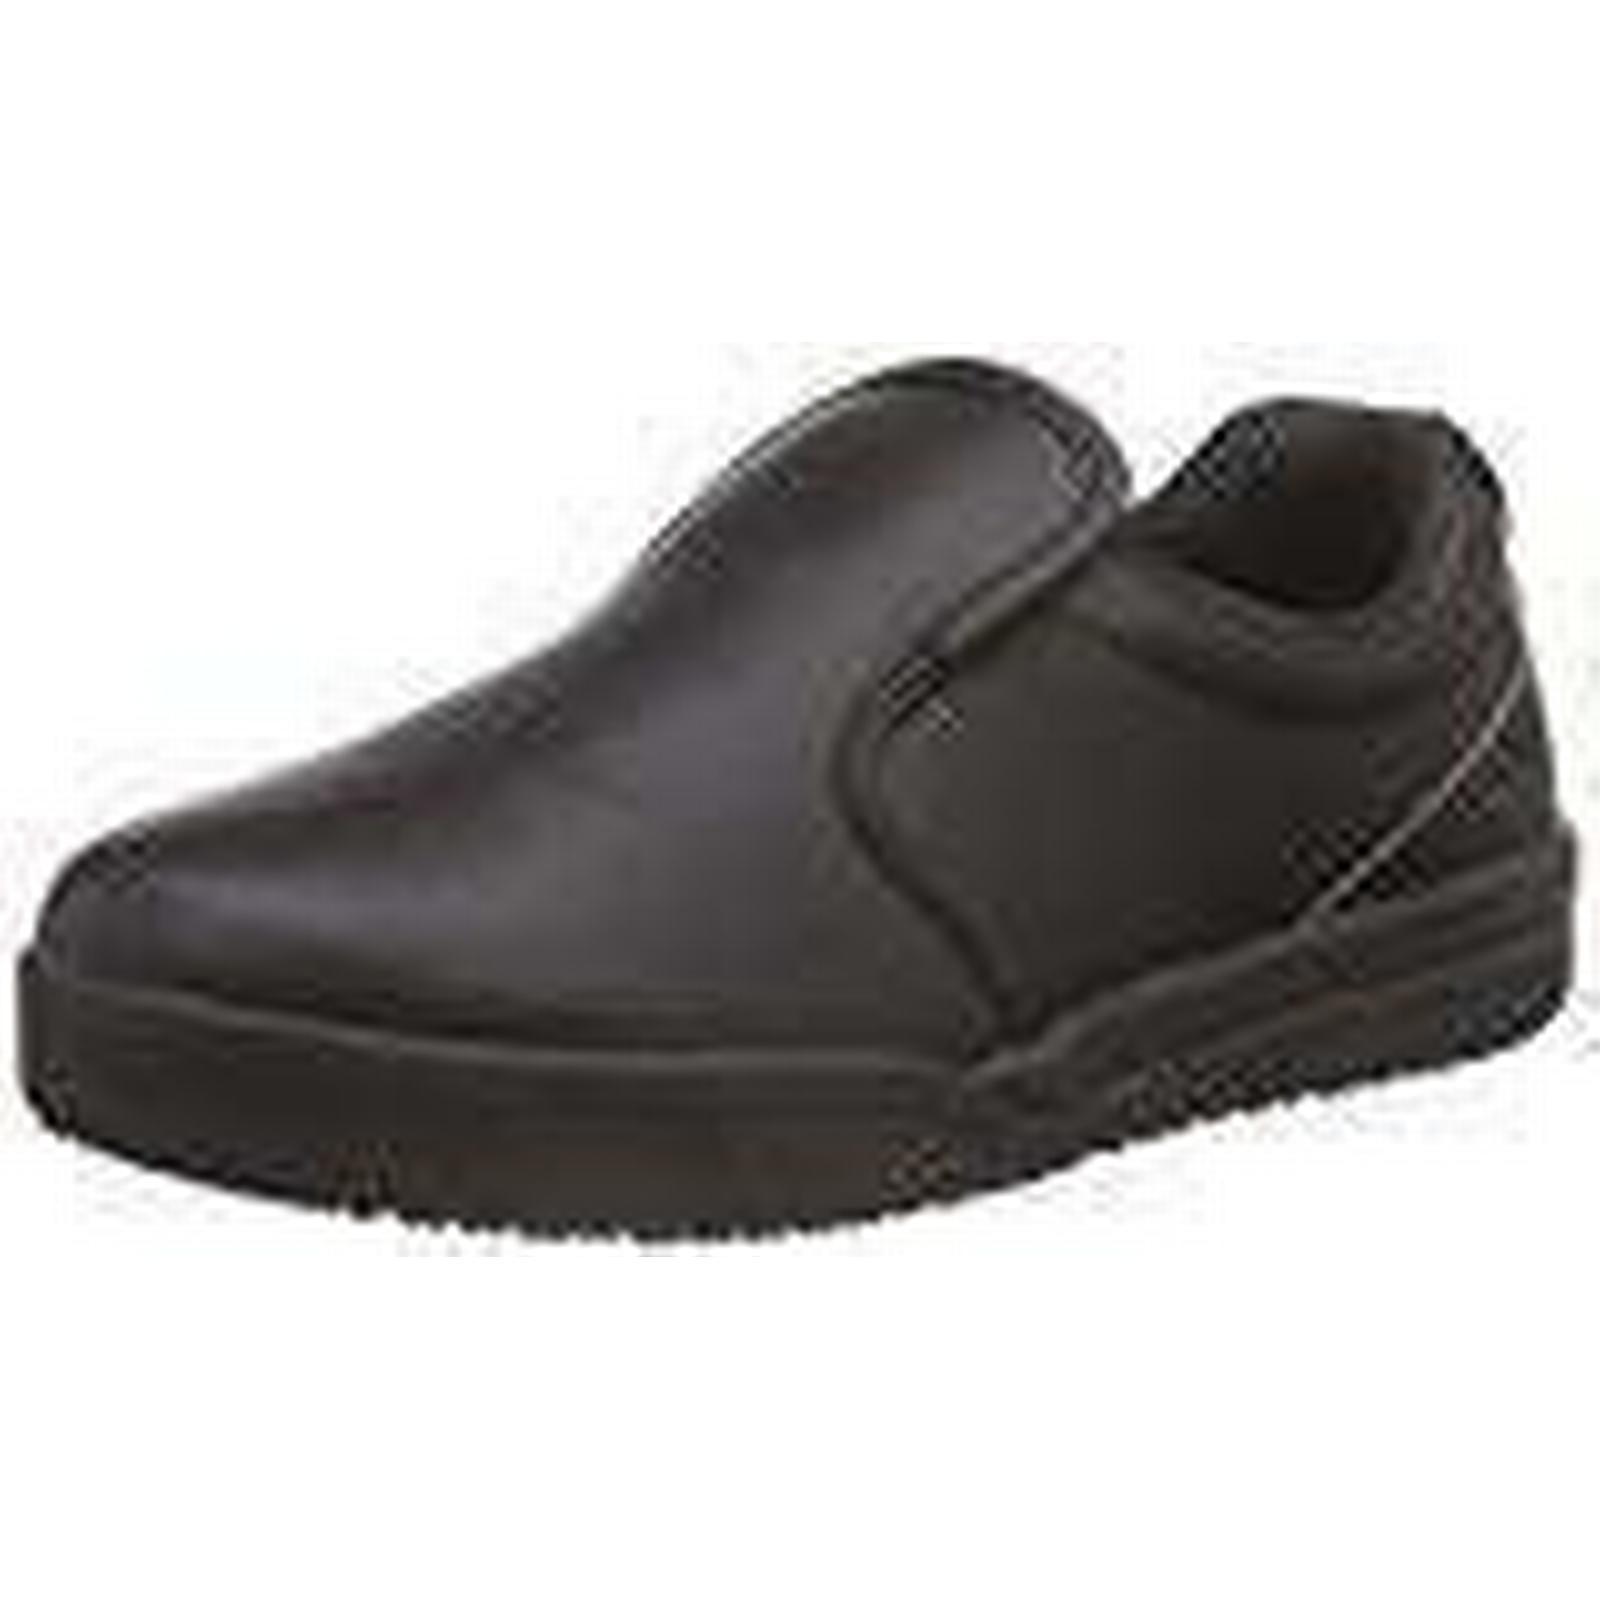 Sanita San-Chef Black Slipper-S2, Unisex Adults' Loafers, Black San-Chef - Schwarz (Black 2), 11 UK (46 EU) c31e39